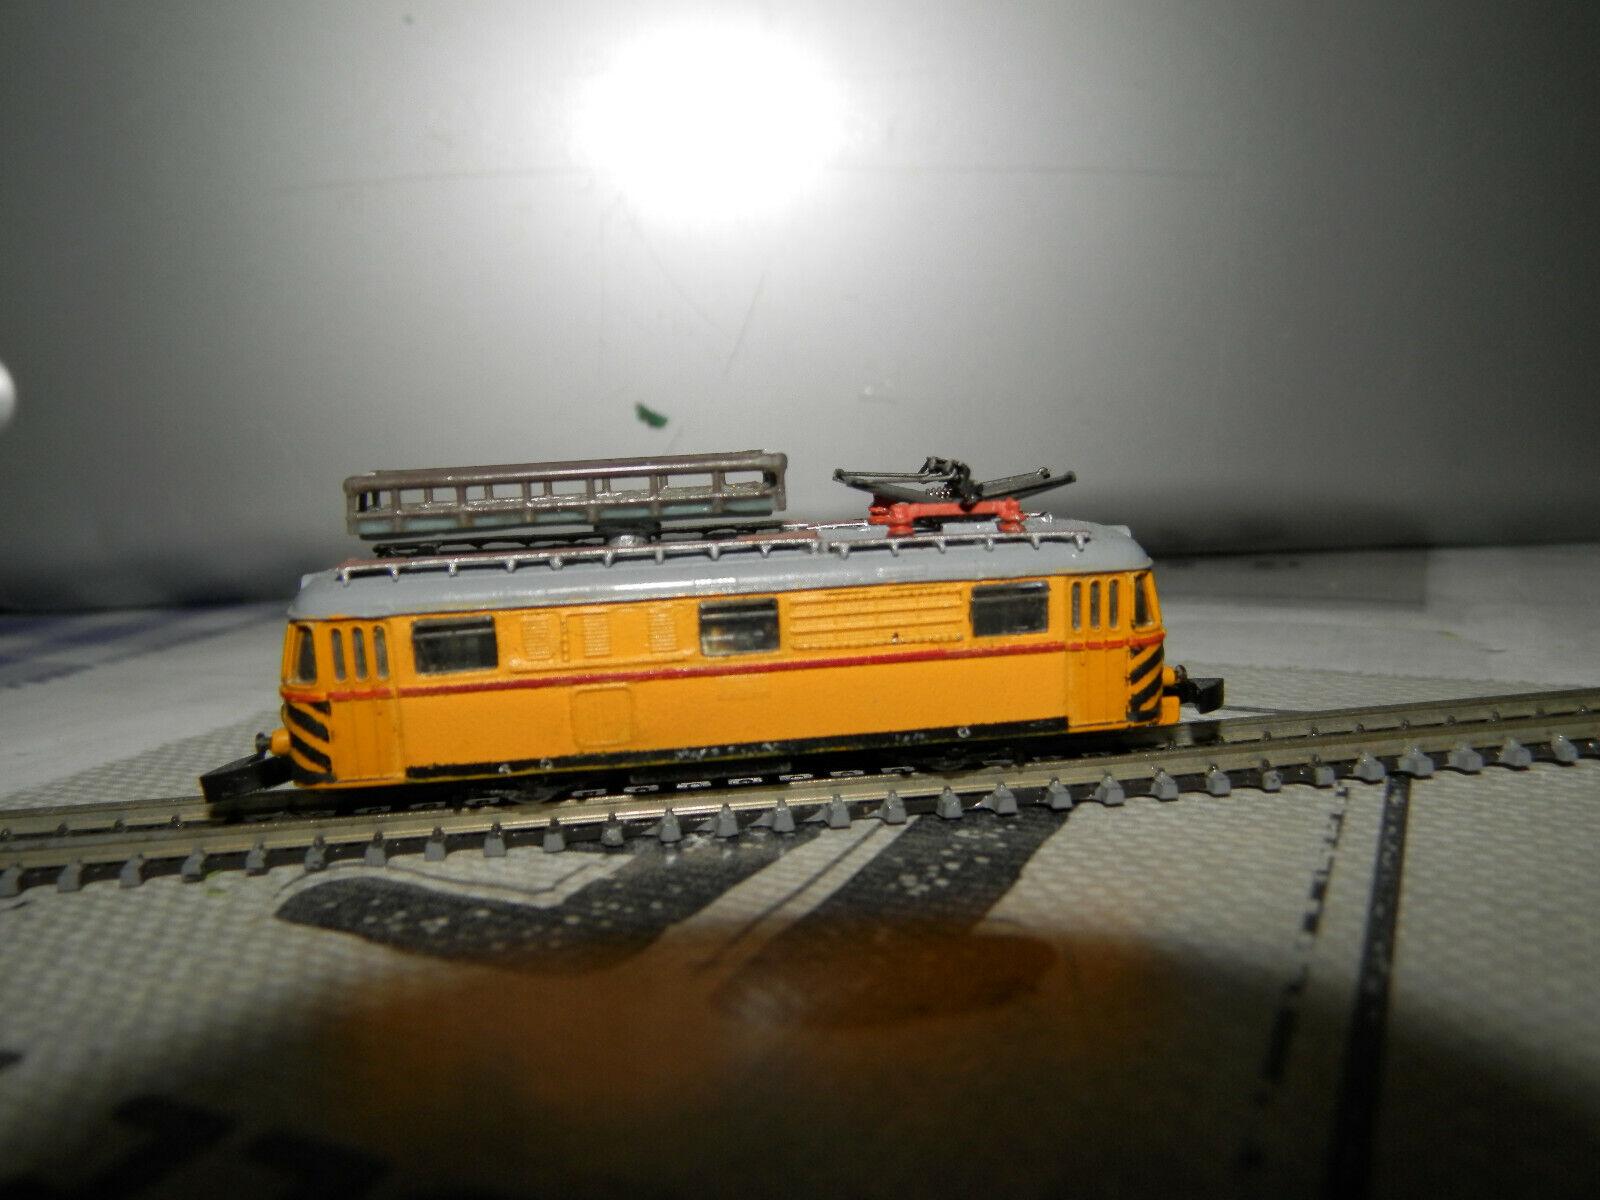 RARE - locomotive for contact network repair Größe- z- 1 220----hand made